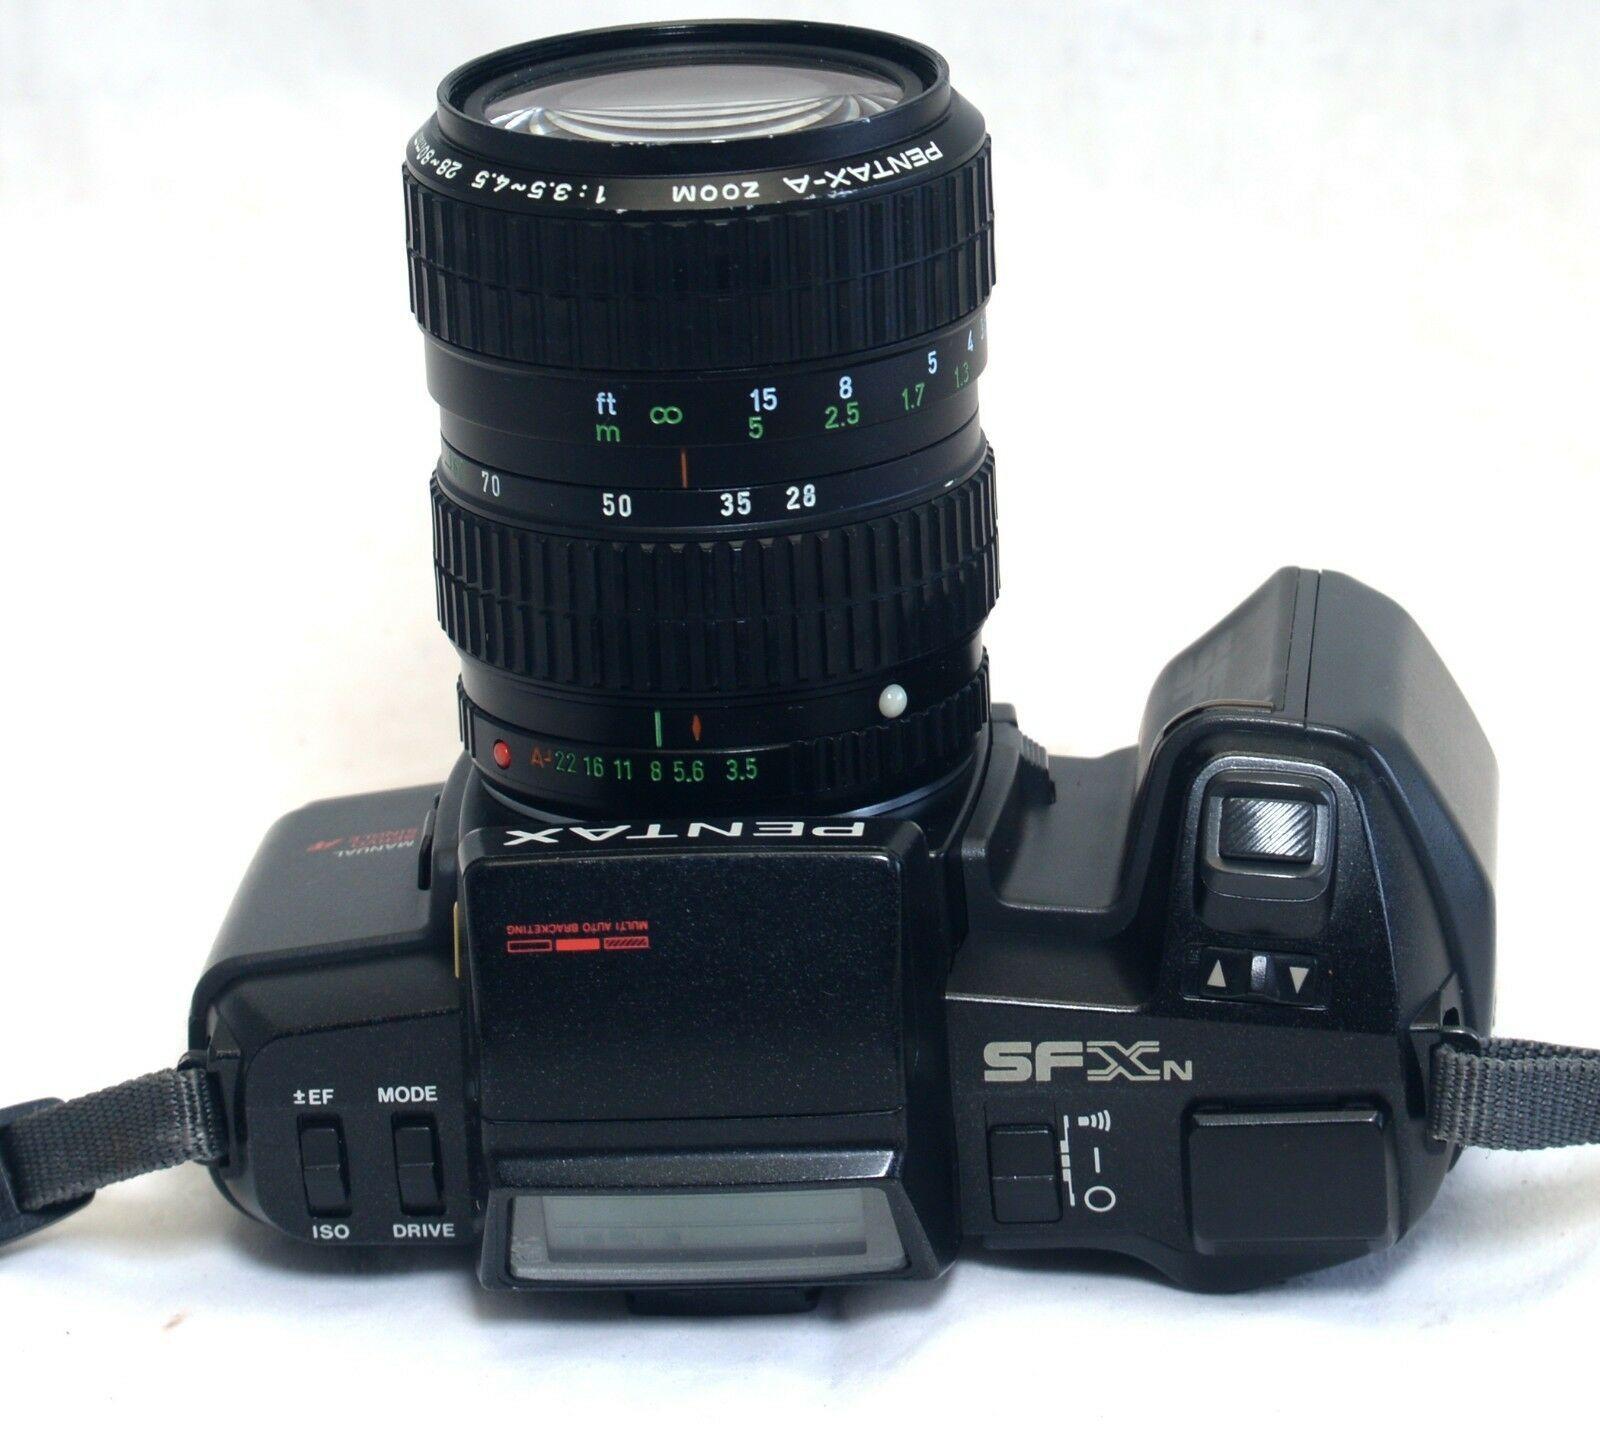 PENTAX SFXn Vintage 35mm FILM Camera 28-80mm f/3.5 Macro Zoom Lens ASAHI Japan